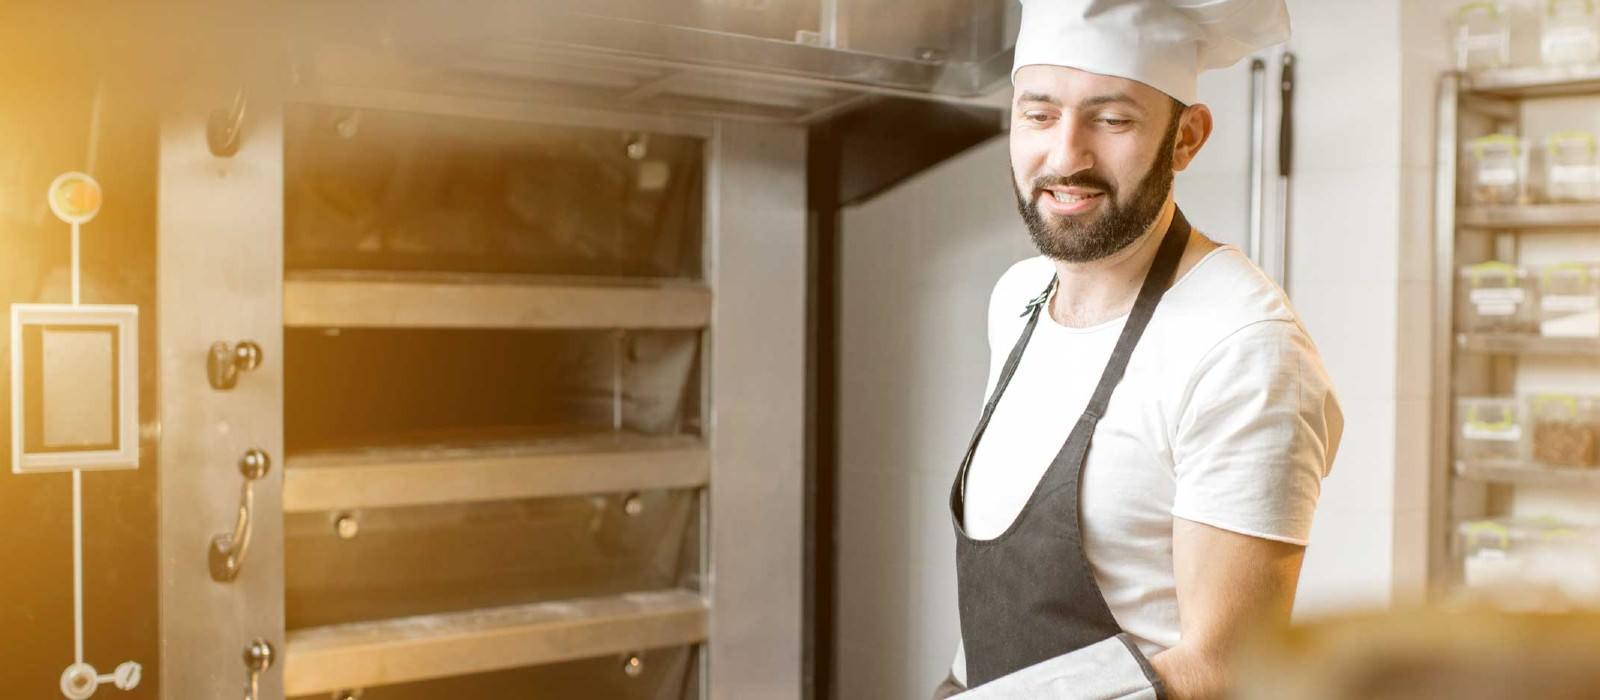 Stadtwerke Neustadt Energie Gas Header Geschäftskunden Bäcker